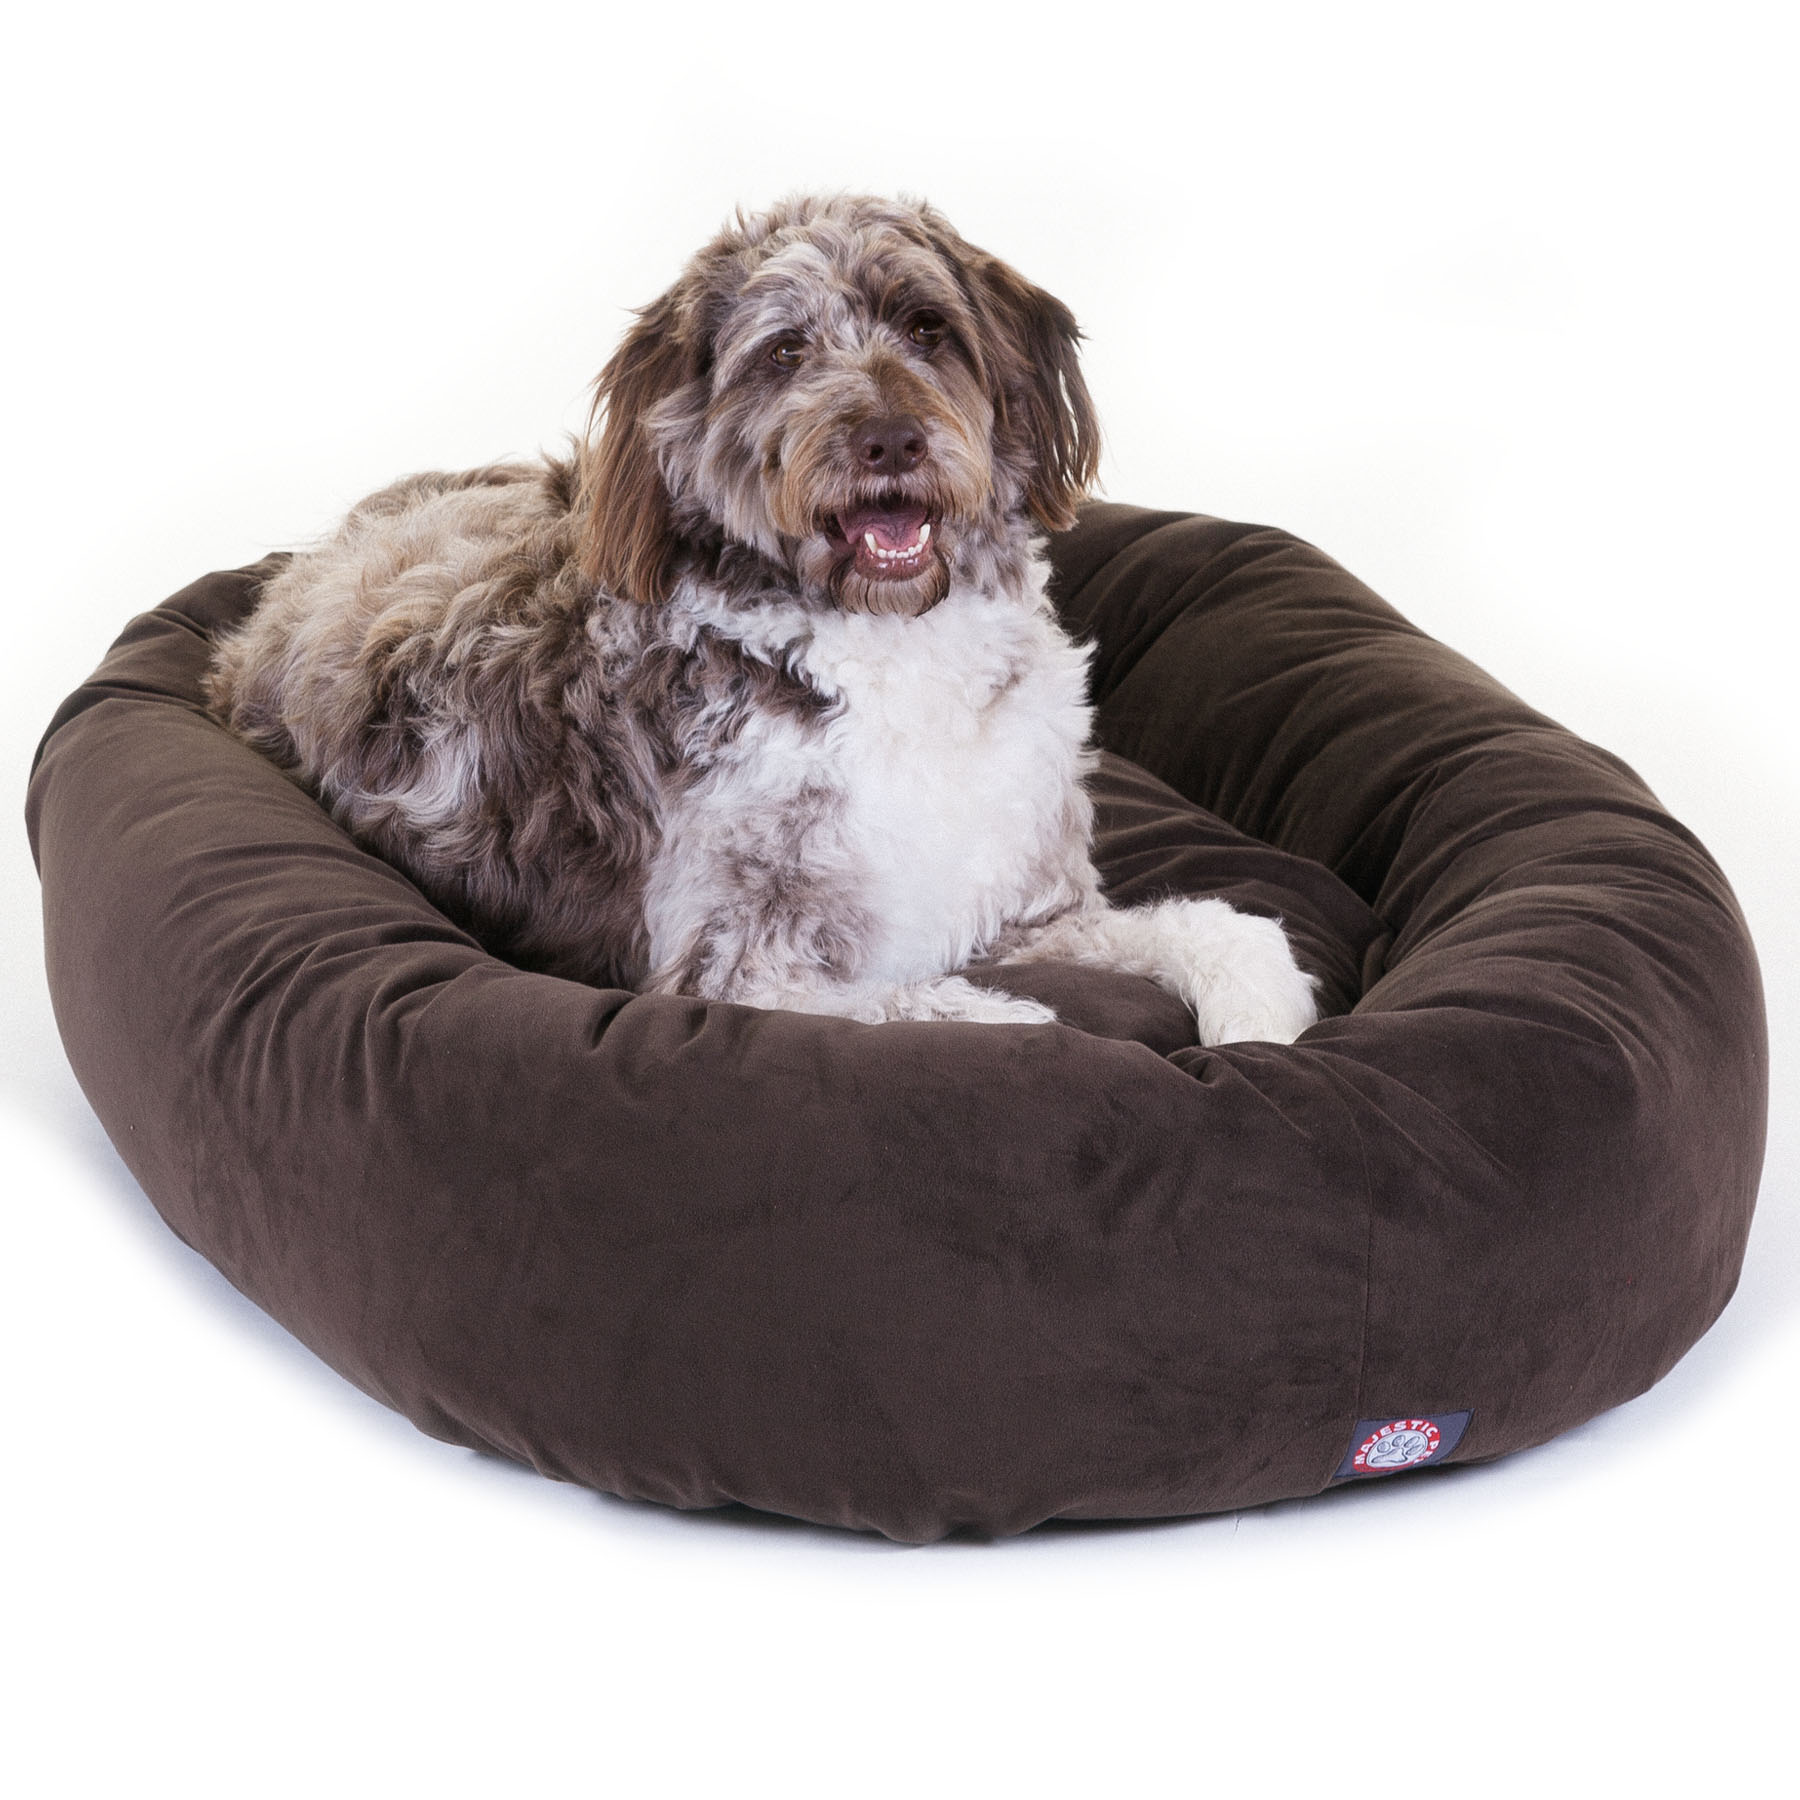 Majestic Pet Suede Bagel Dog Bed Spine Support Bolster Machine Washable